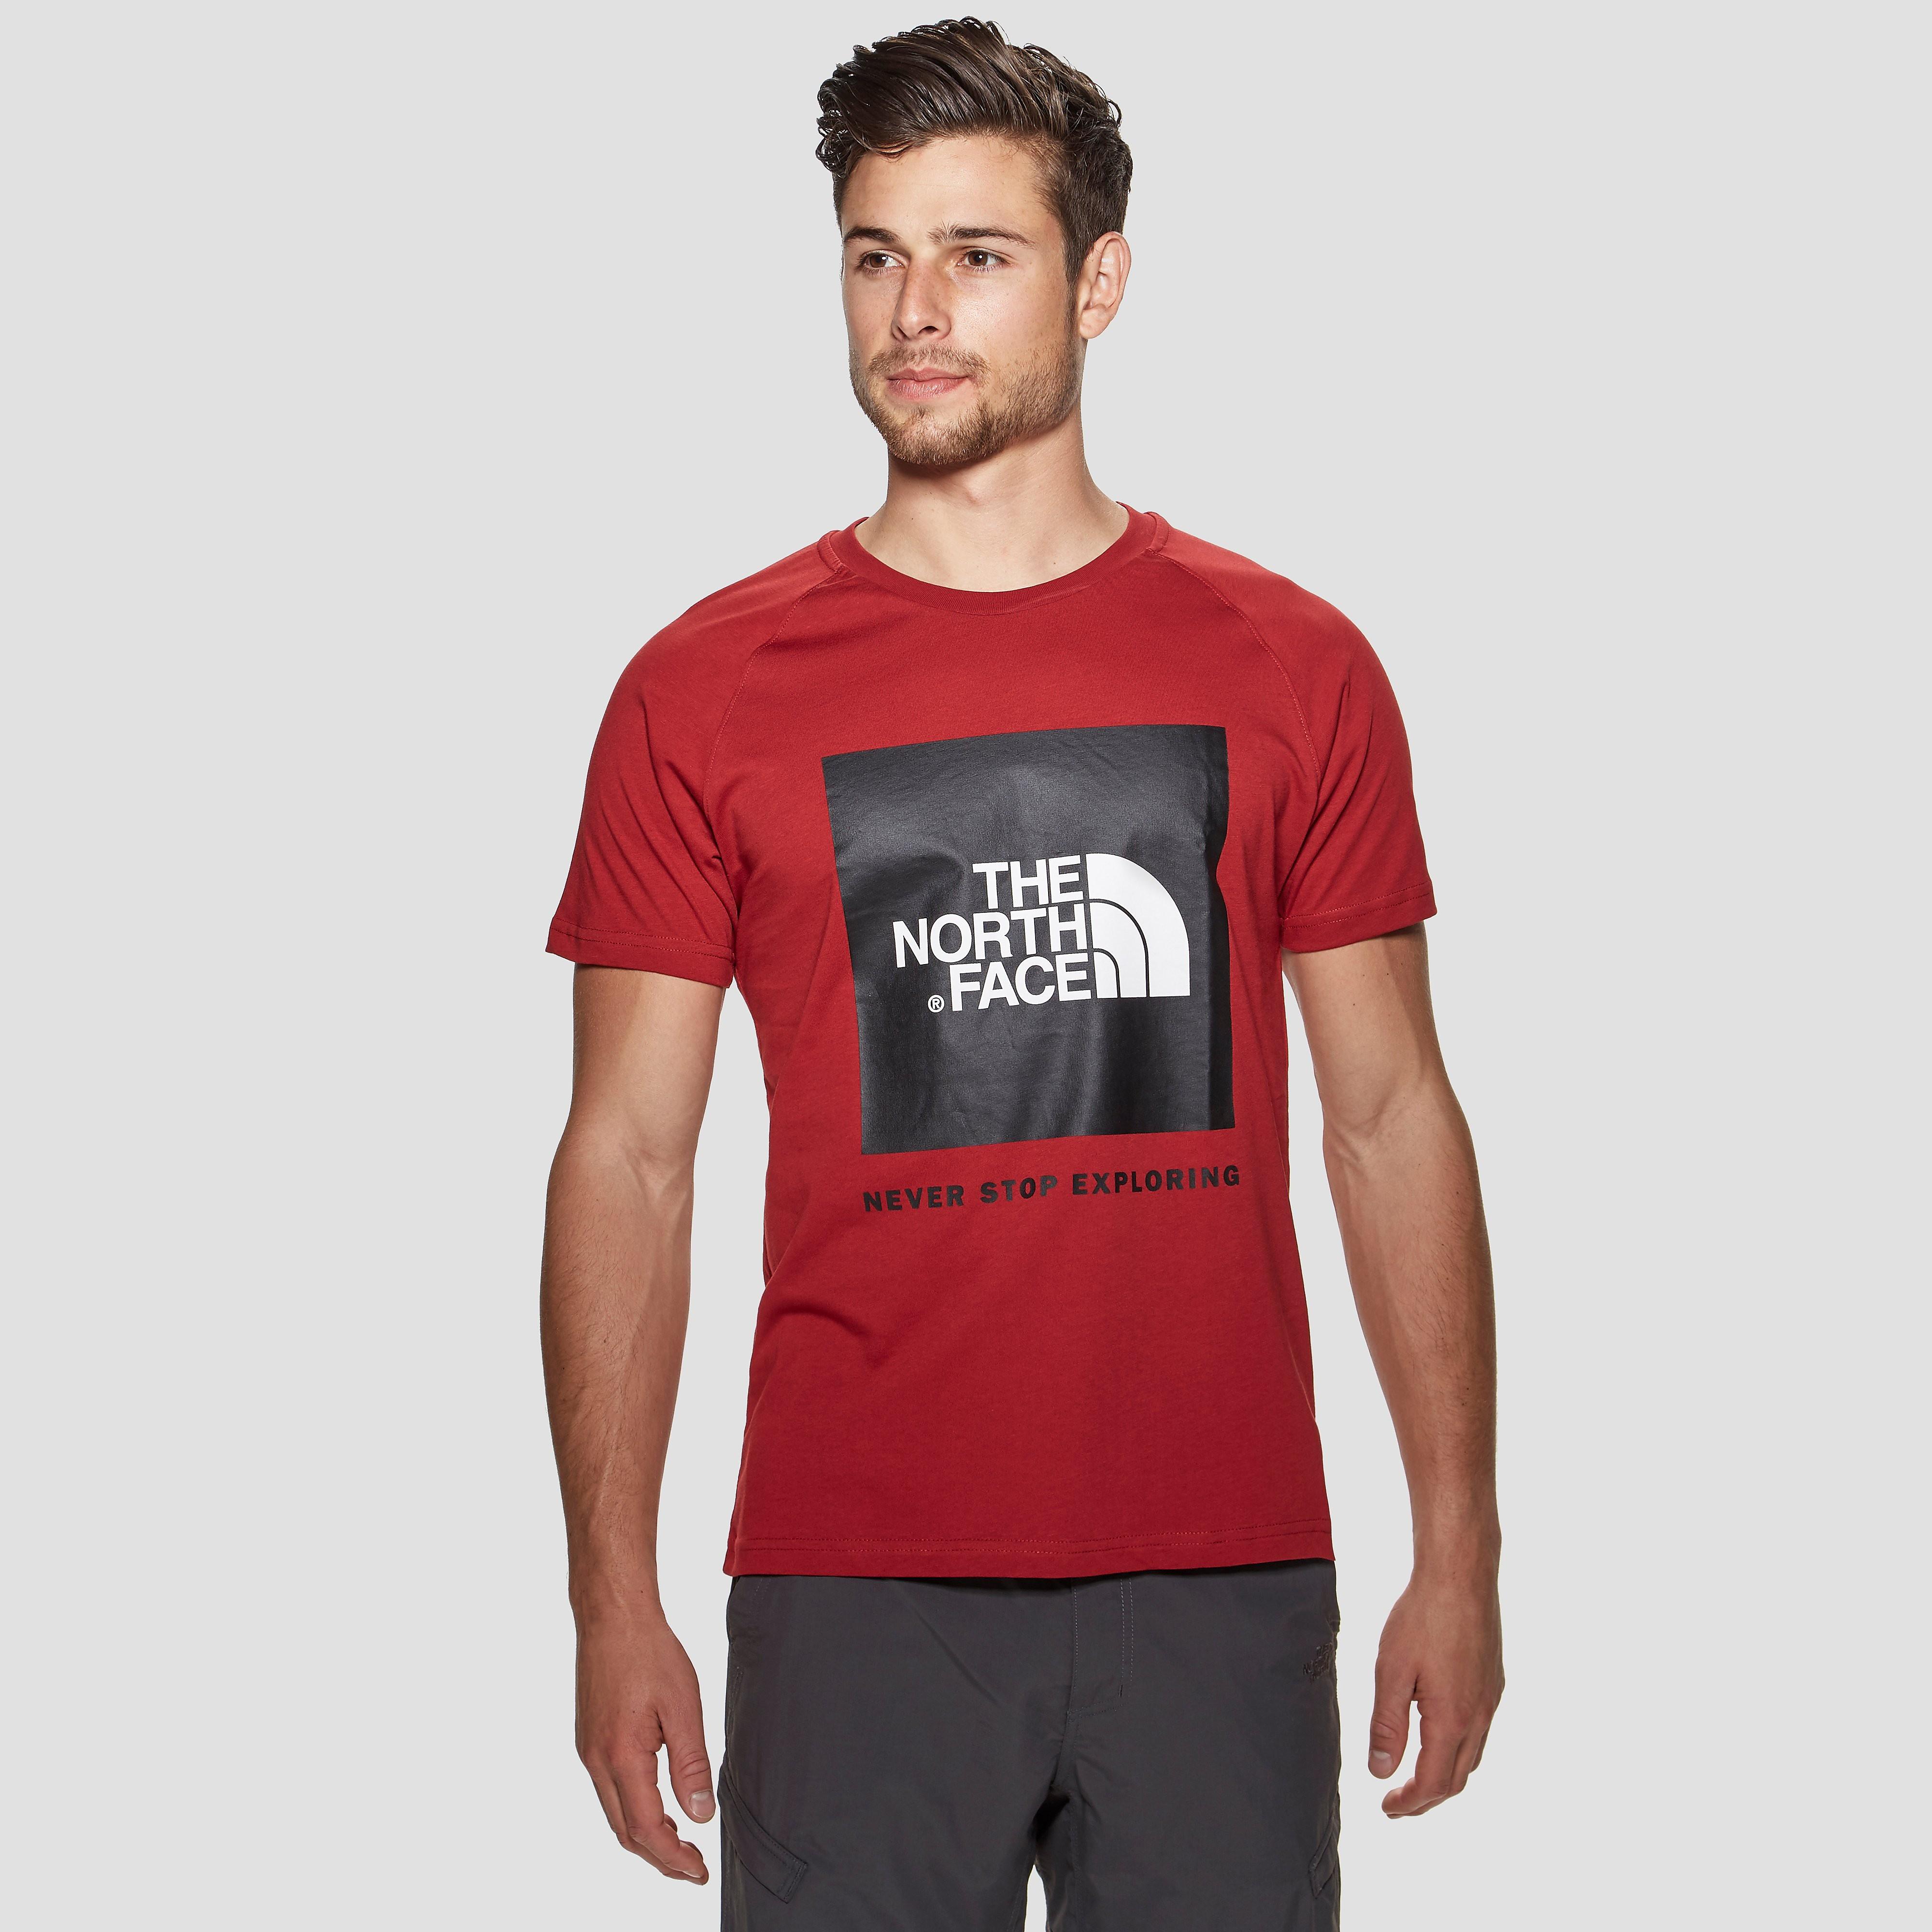 The North Face Raglan Red Box Men's T-shirt